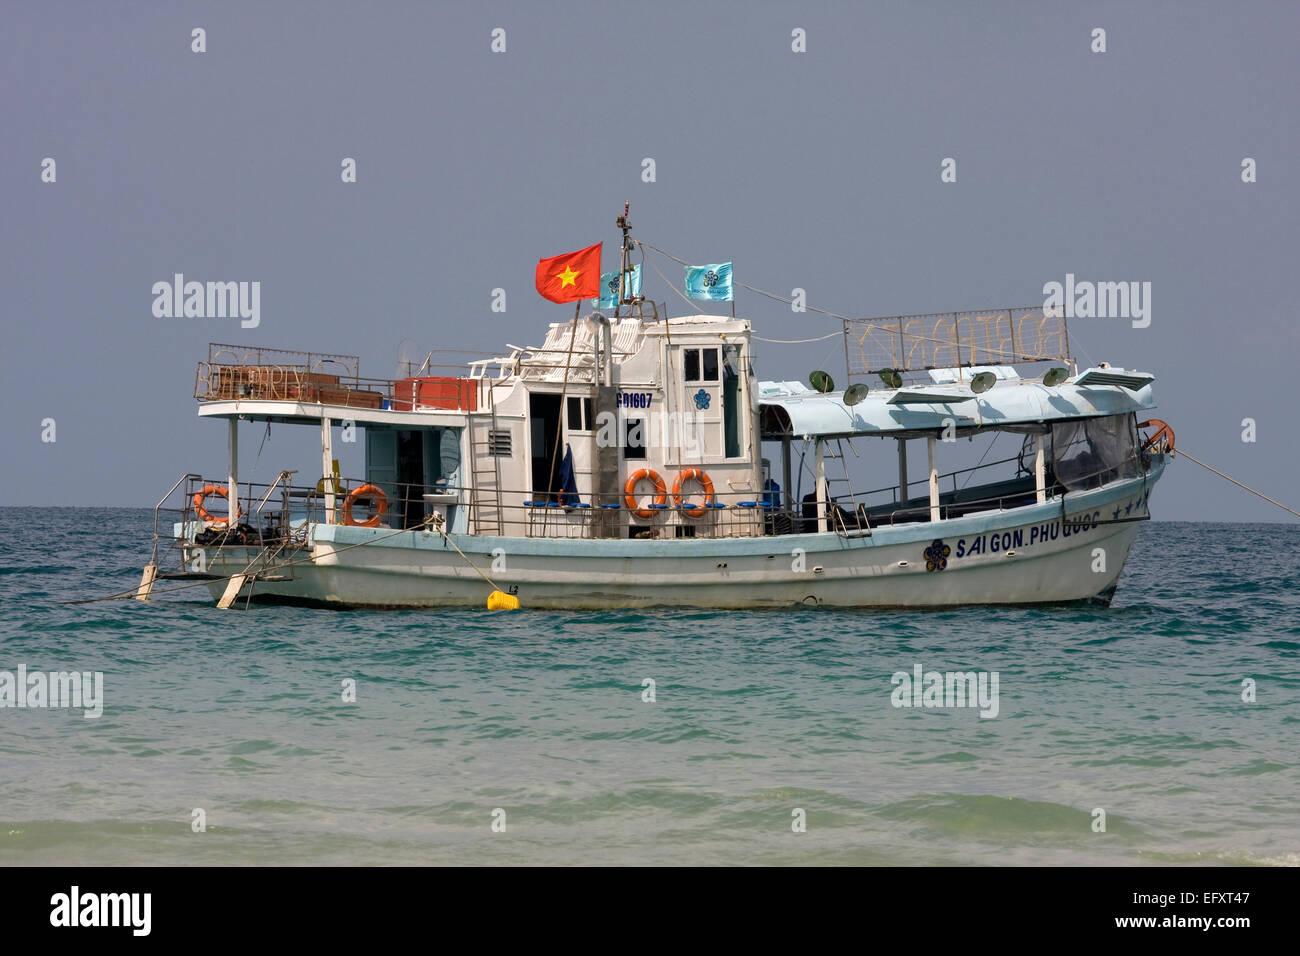 Excursion boat, Sao Beach, Phu Quoc Island, Vietnam, Asia - Stock Image